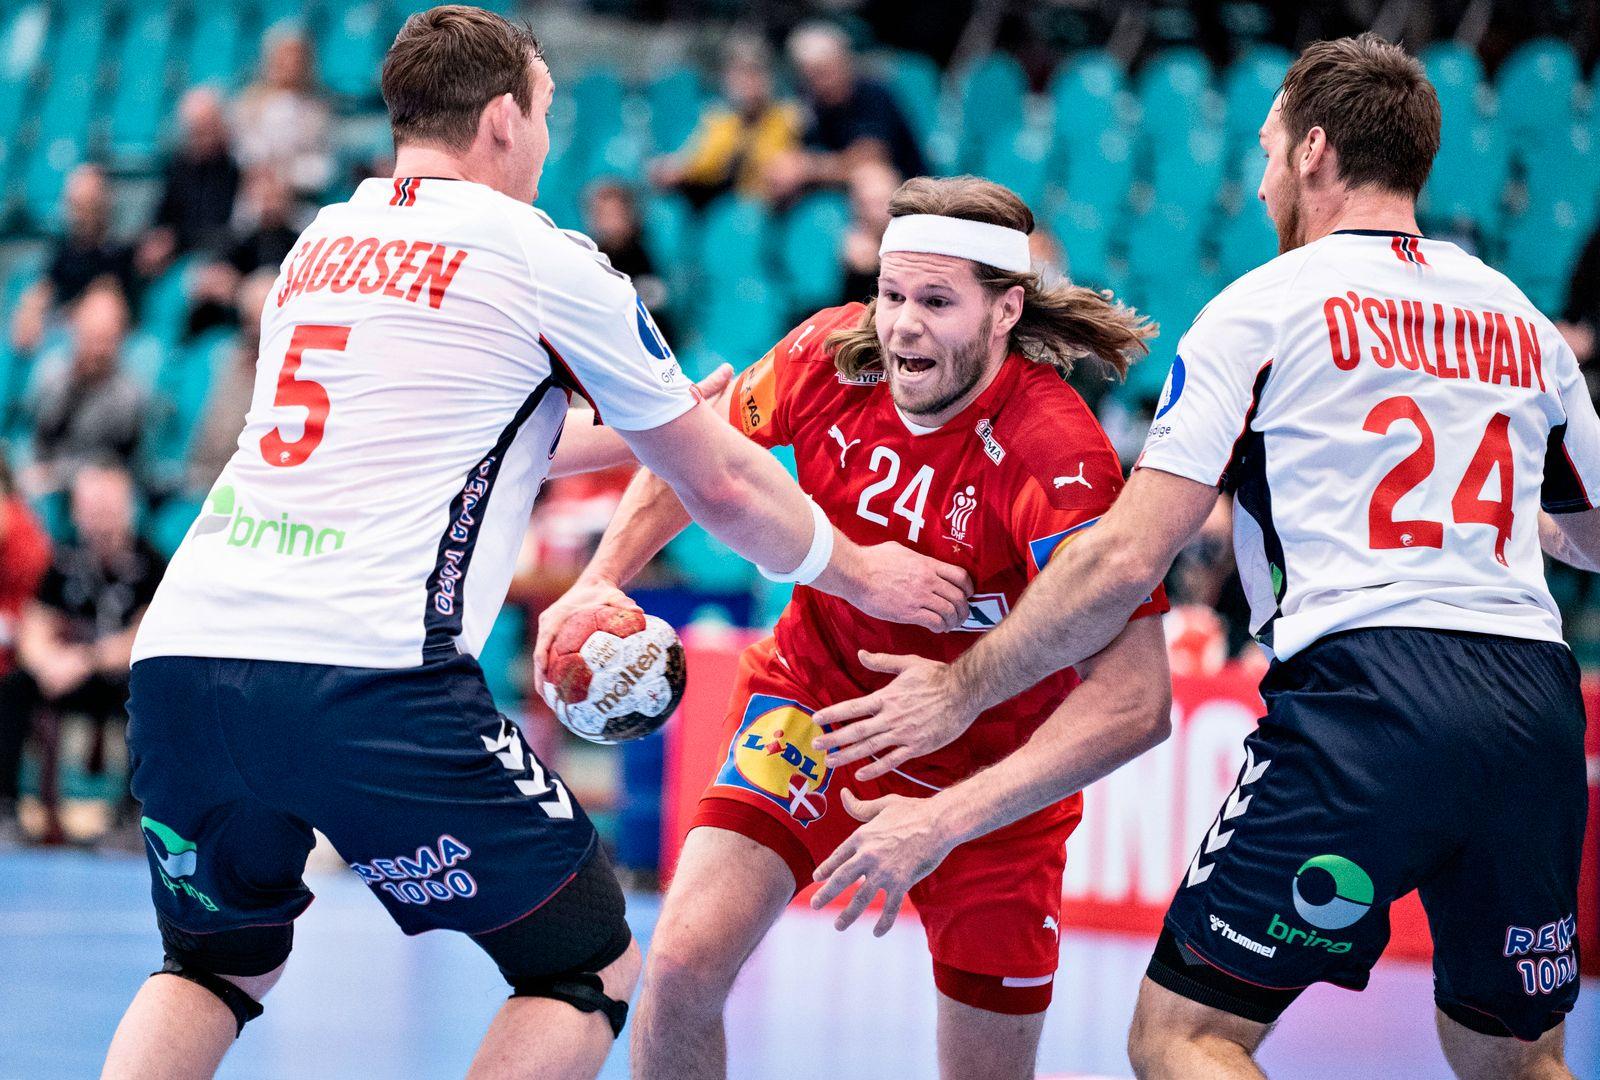 Danmarks Mikkel Hansen mod Norges Sander Sagosen og Christian O Sullivan i Bygma Cup landsholdskampen i herrehaandbold